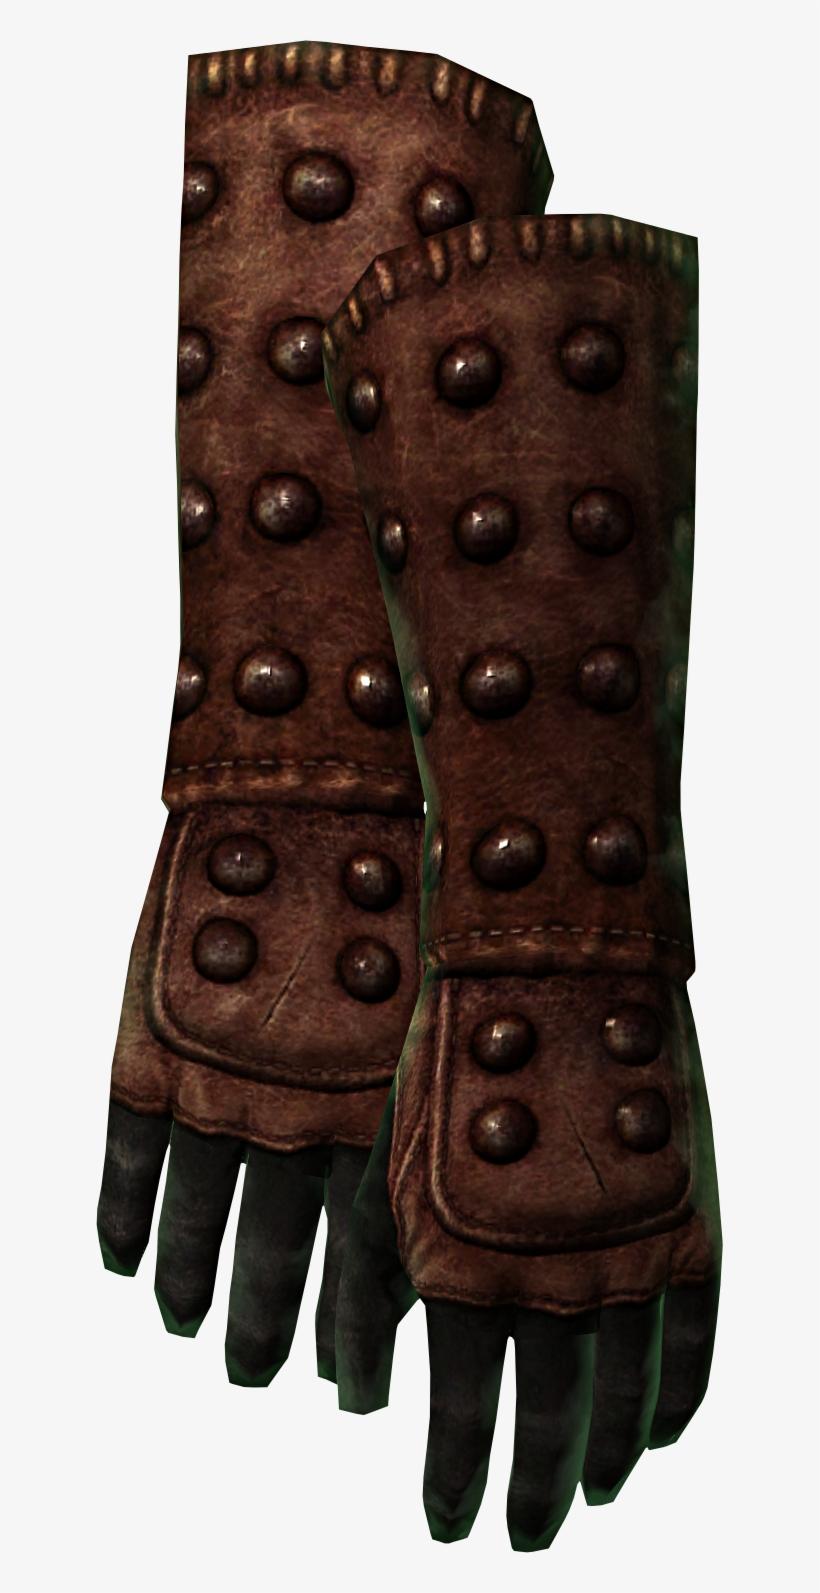 Tumblerbane Gloves - Leather Gauntlets Skyrim - 627x1513 PNG